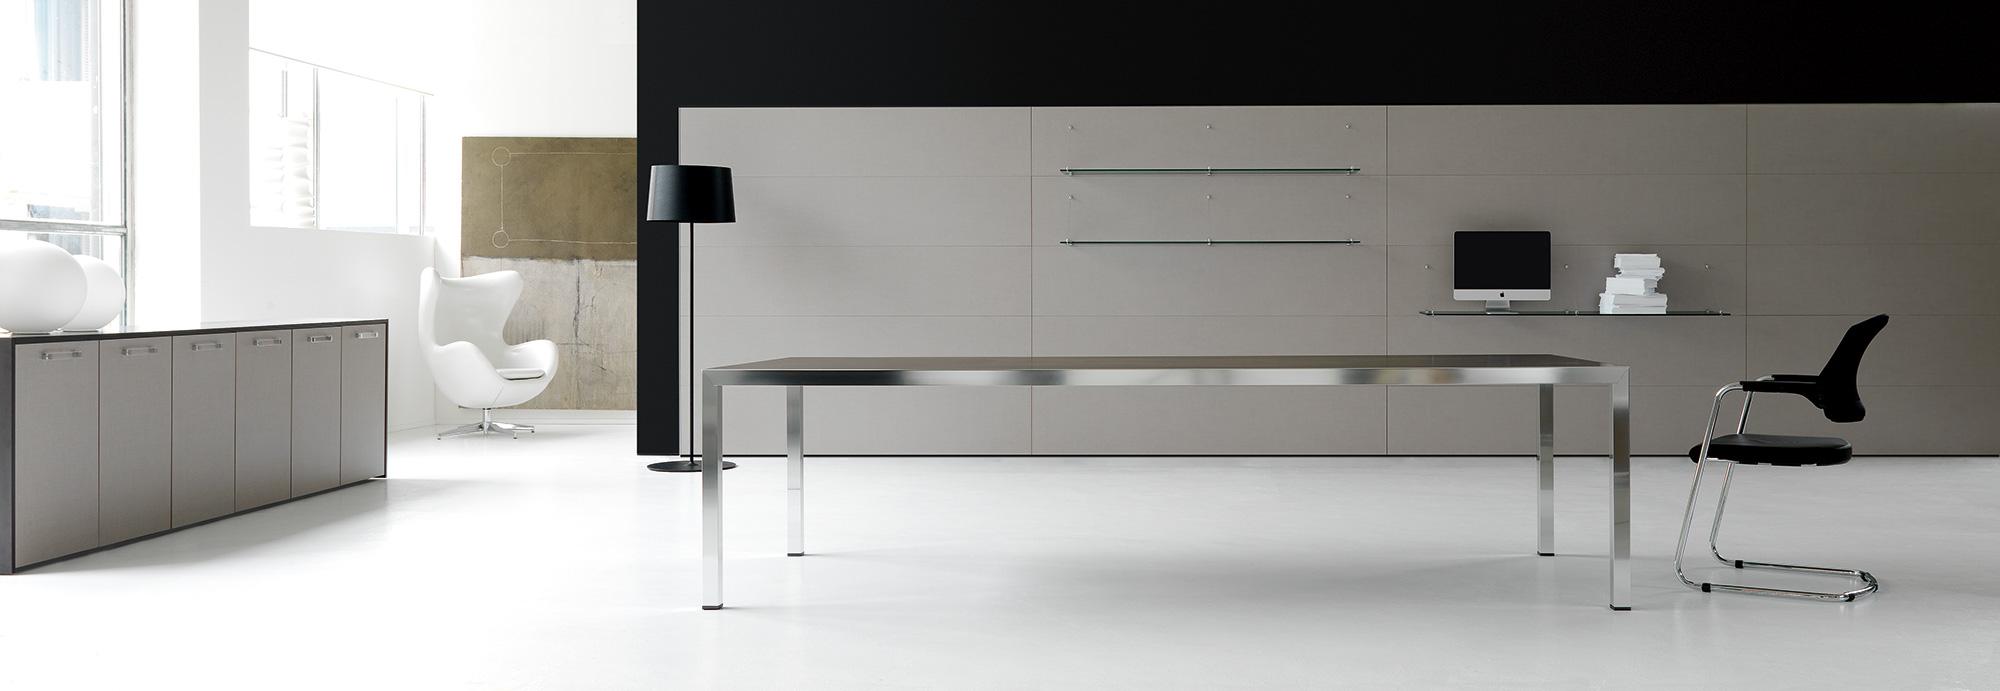 Prezentare produs mobilier pentru birouri fly 4 ivm for Mobilier fly